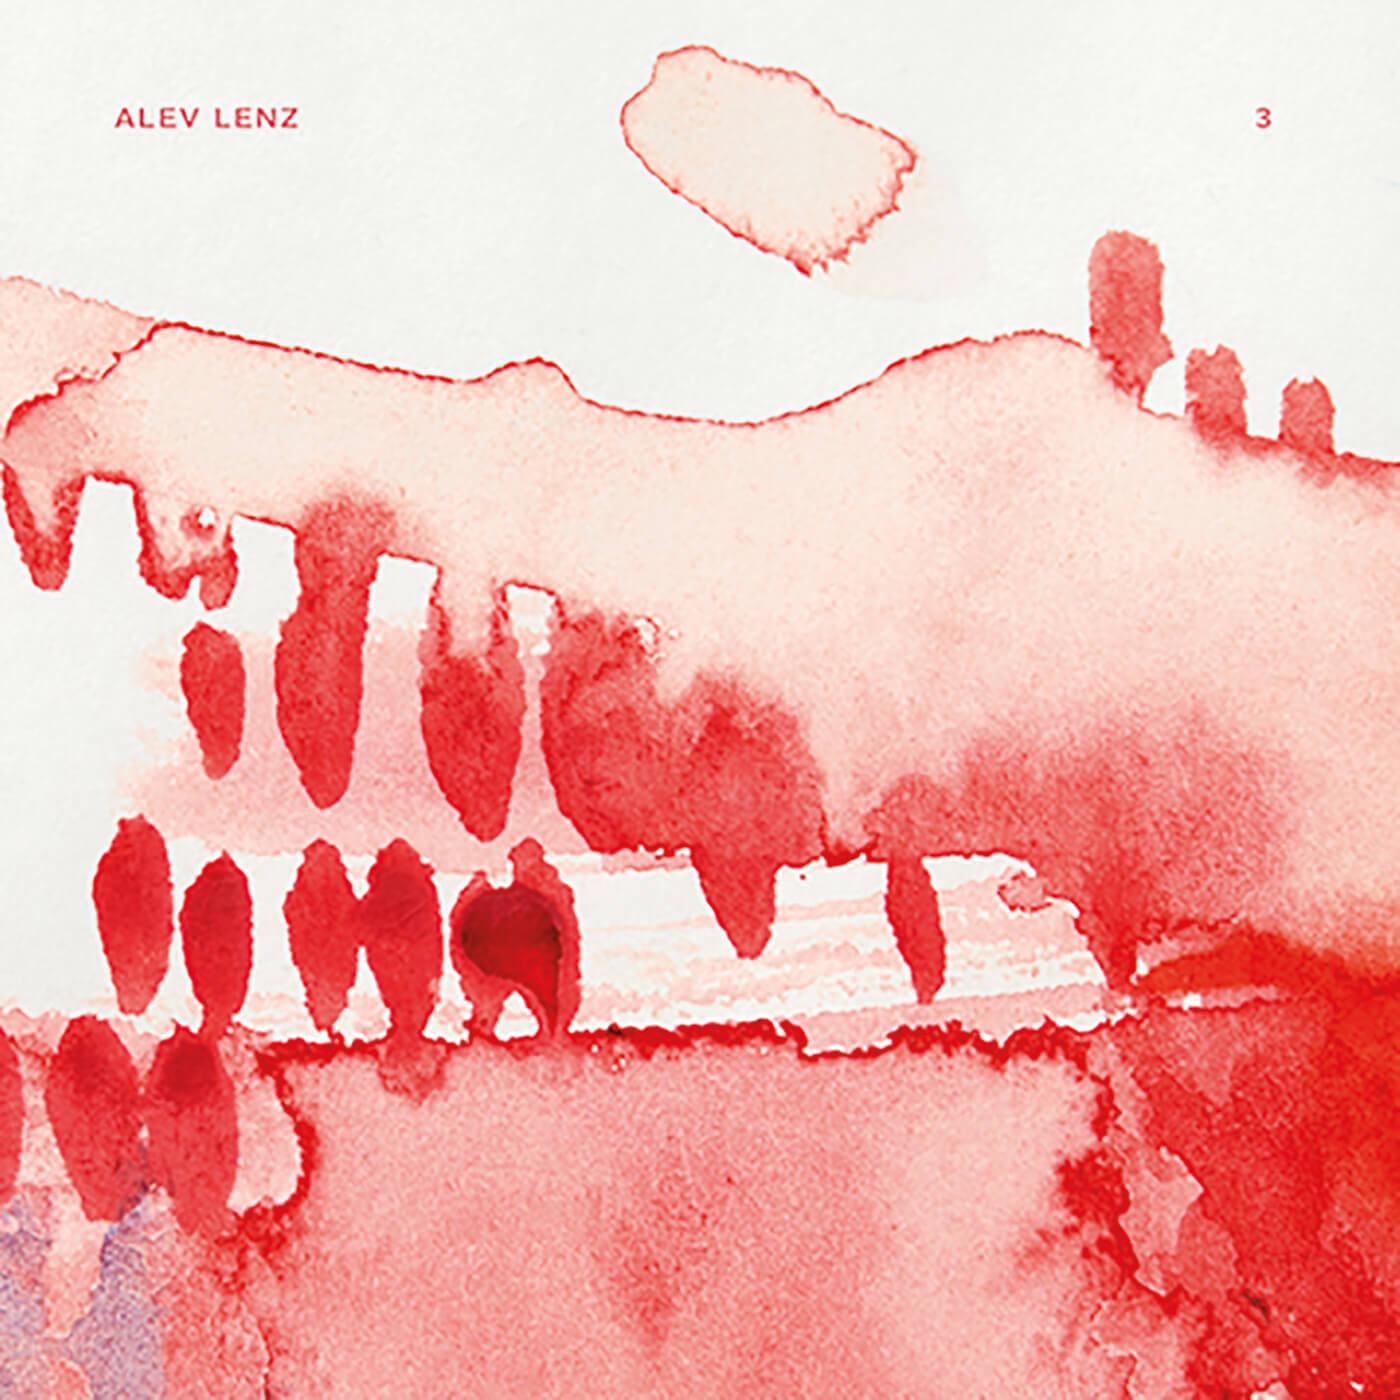 Alev Lenz (Album)